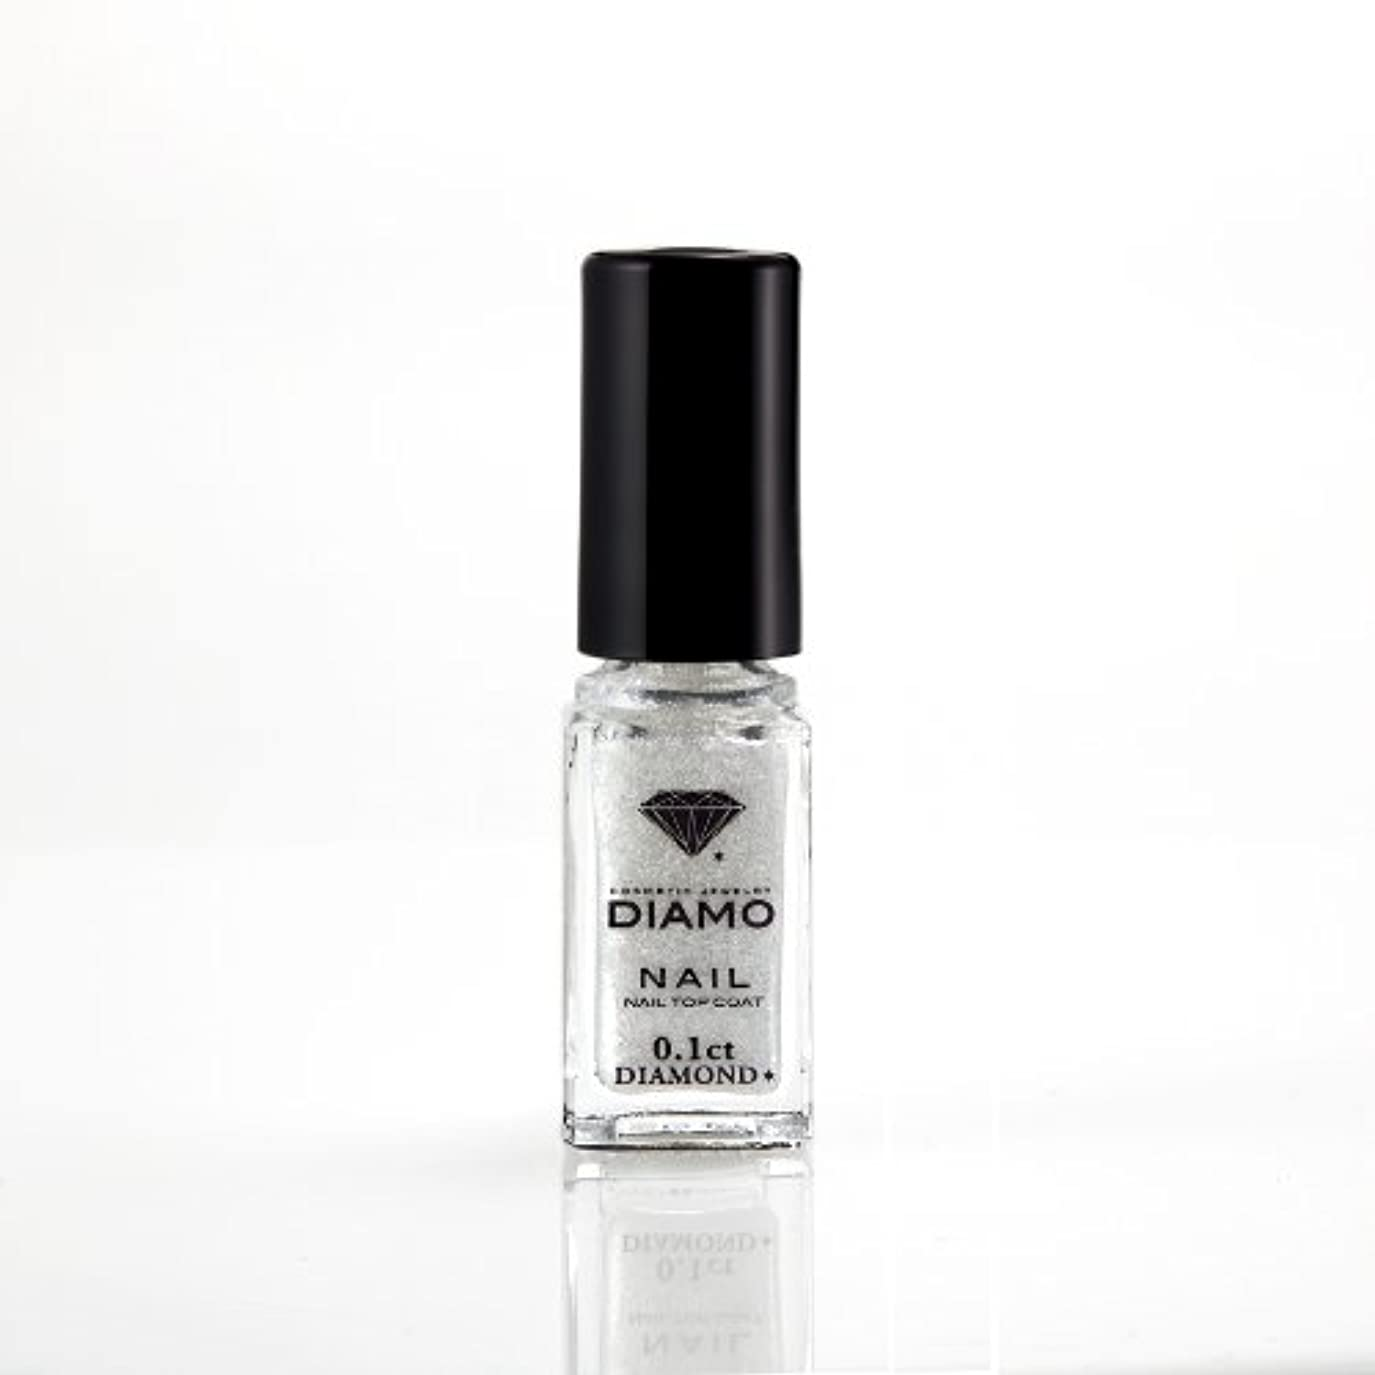 DIAMO NAIL TOP COAT ディアモ ネイル トップコート0.1ct 天然ダイヤモンド粉末入り5ml